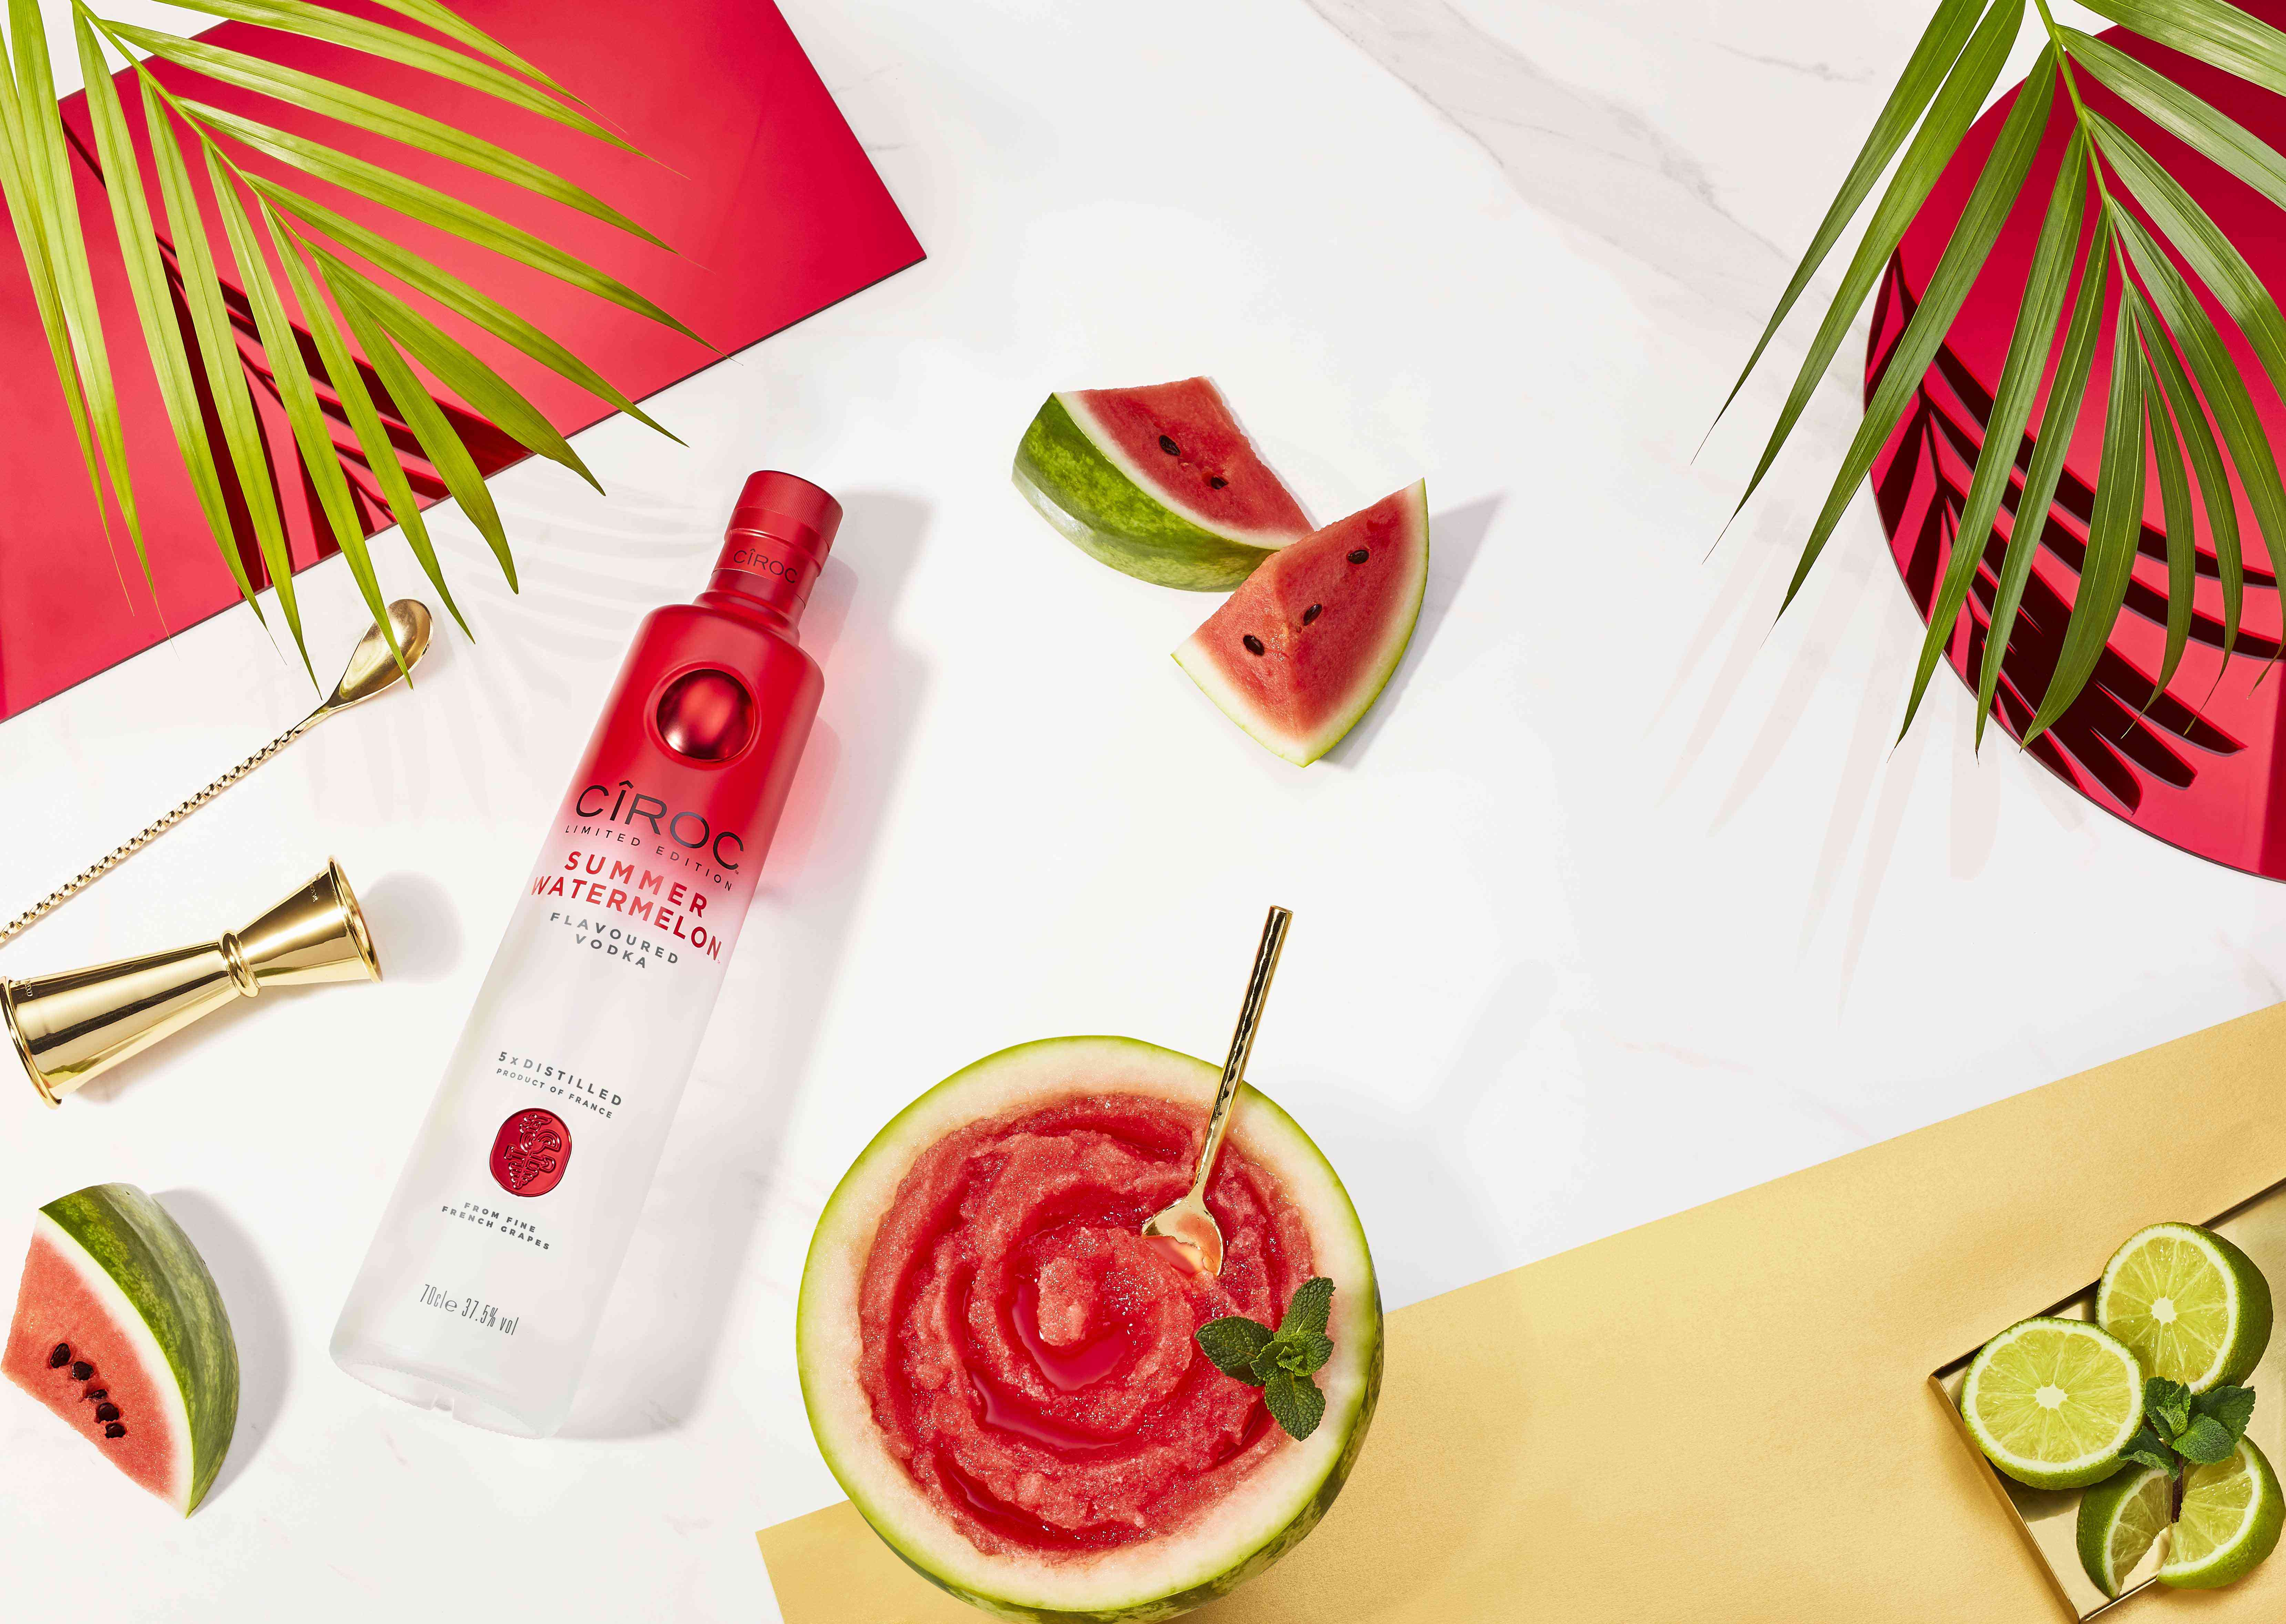 Ciroc Vodka Summer Watermelon